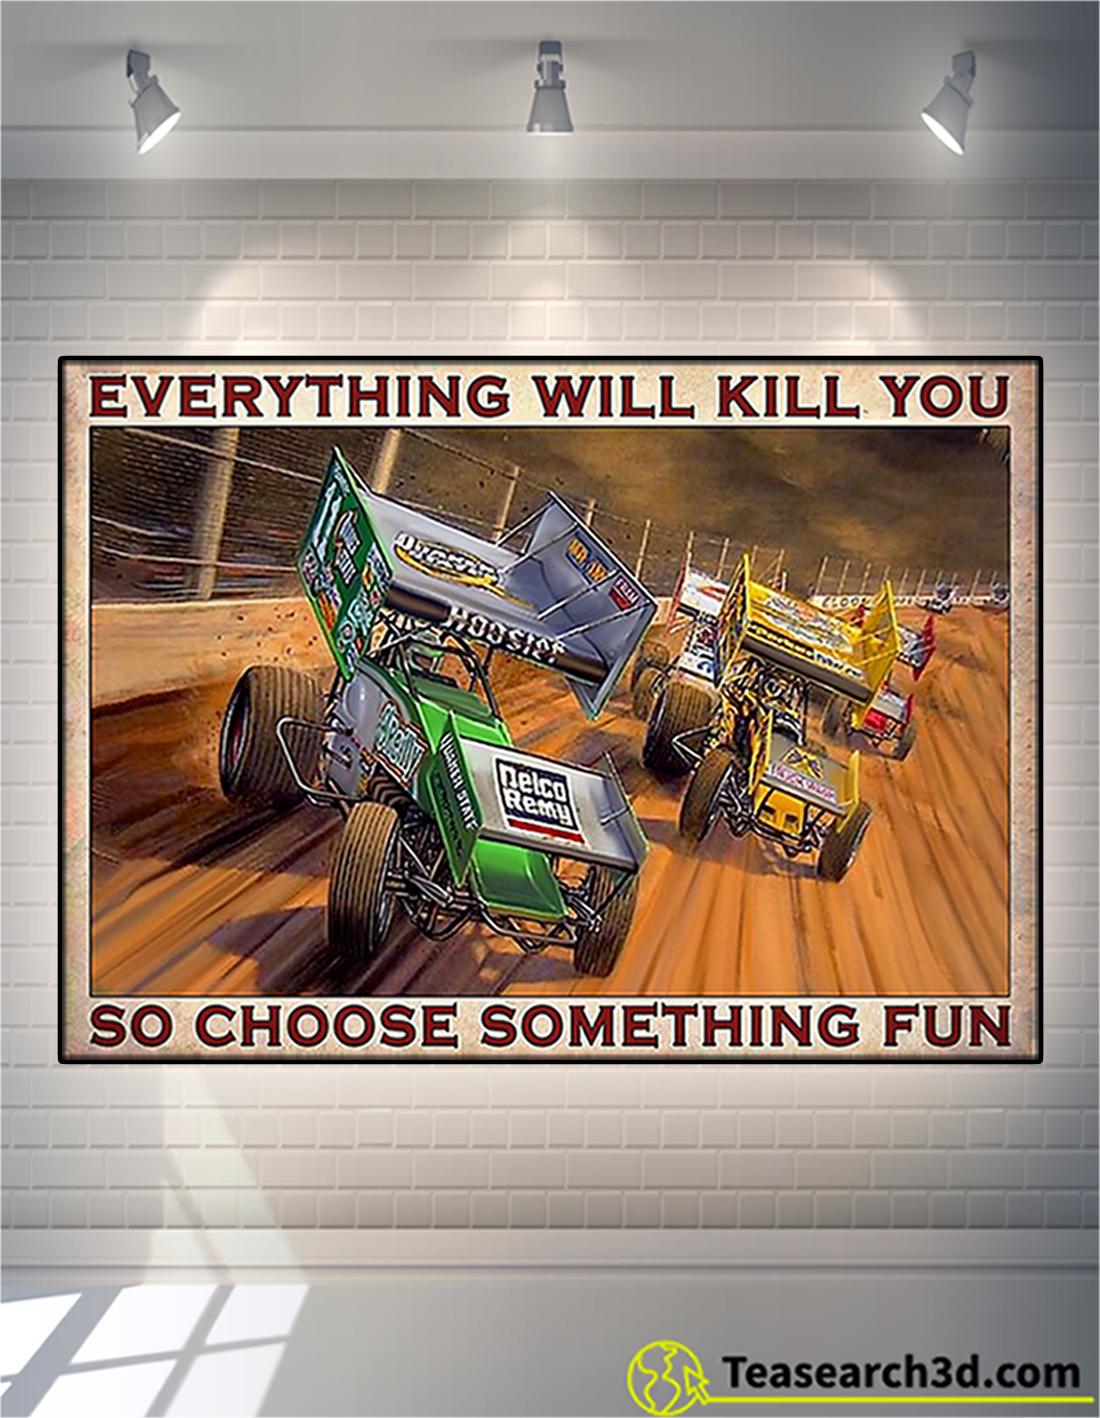 Dirt track racing so choose something fun poster A2